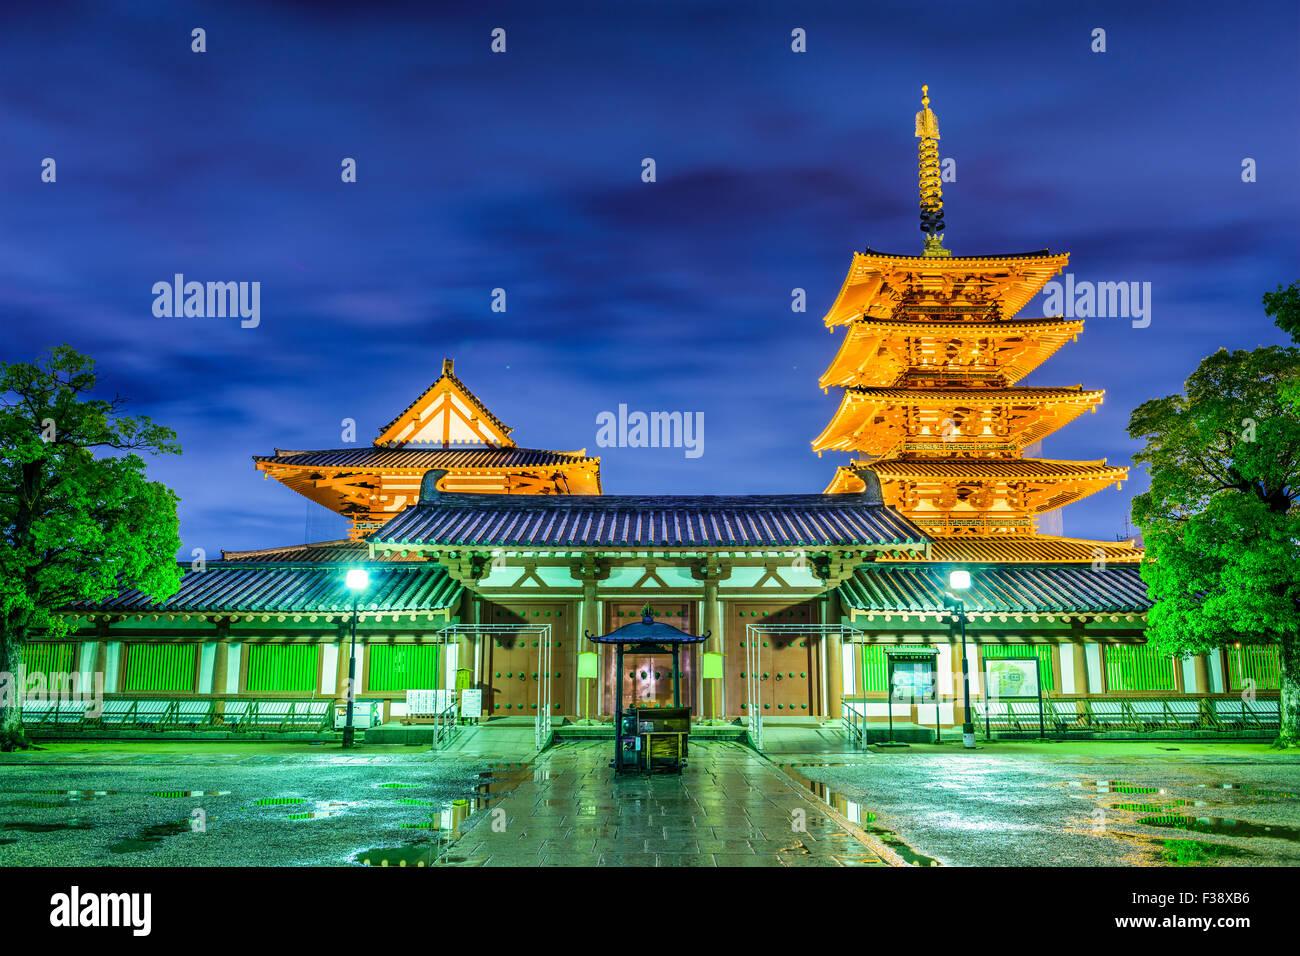 Shitennoji Temple in Osaka, Japan. - Stock Image